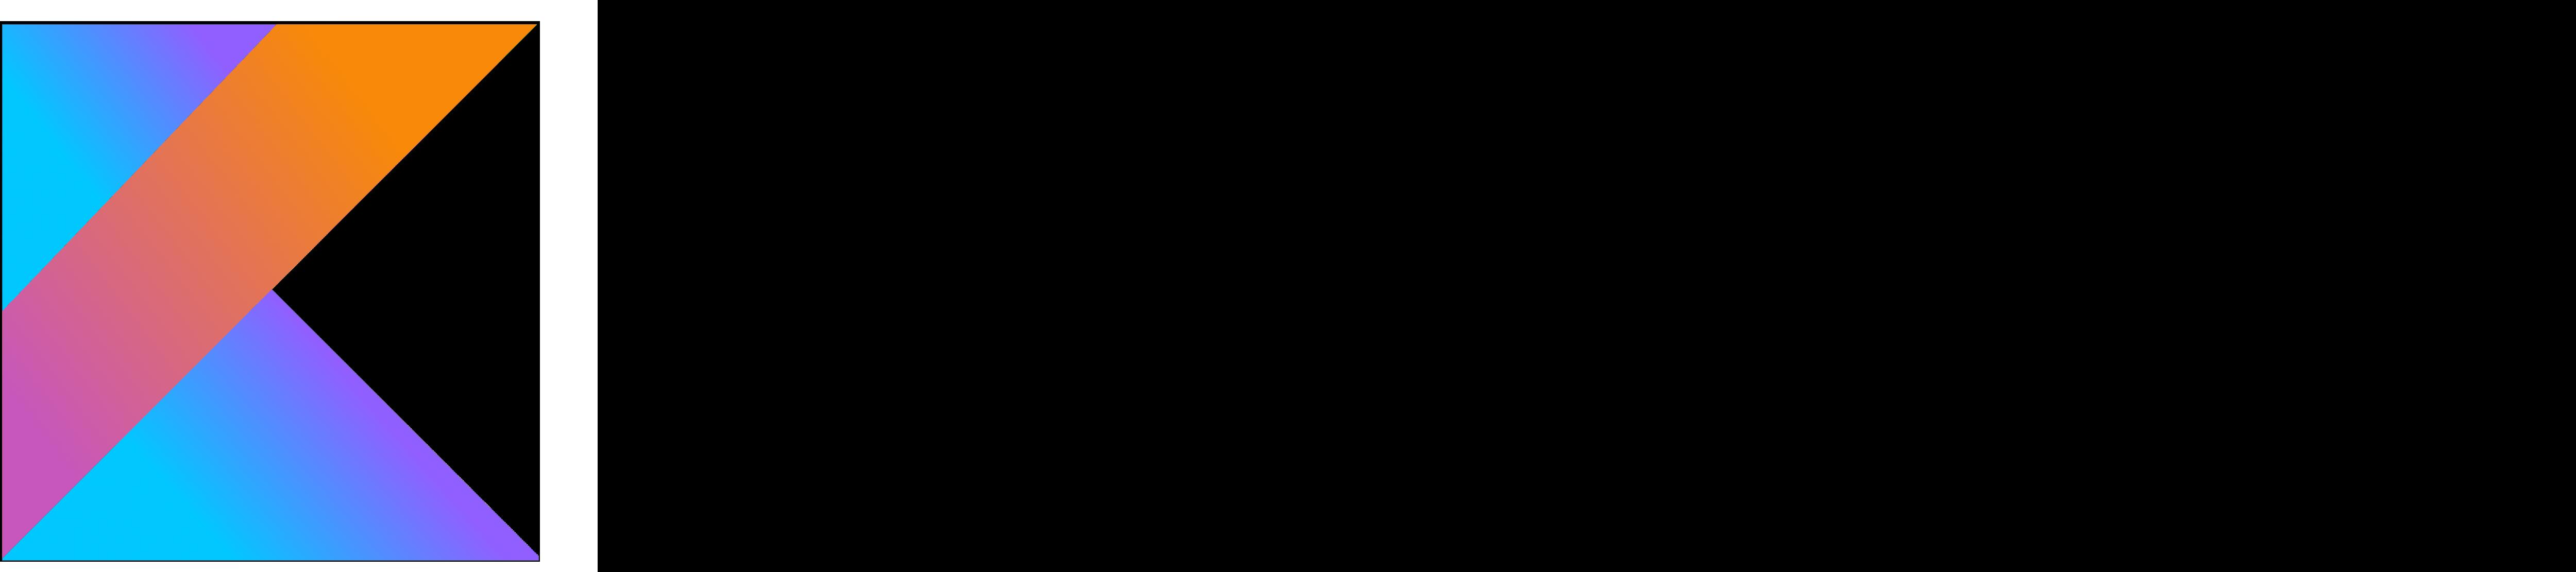 Kotlin_logo_wordmark